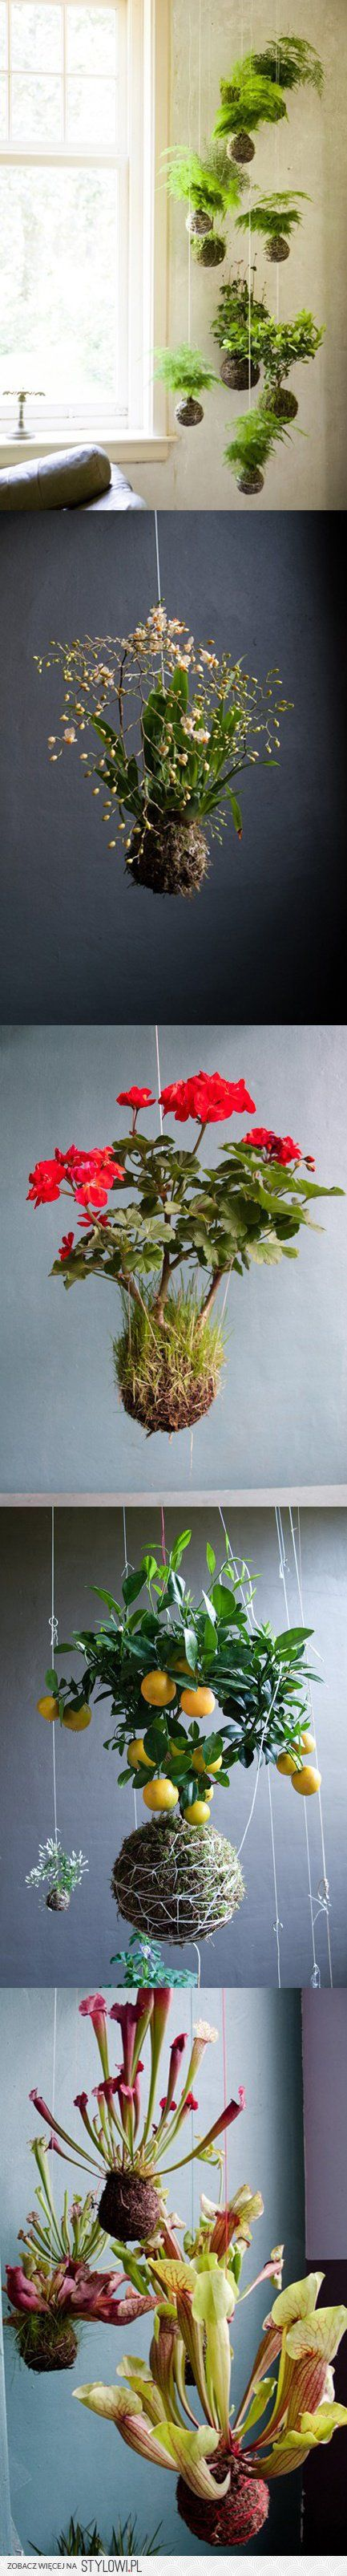 Something for plants under the pergola